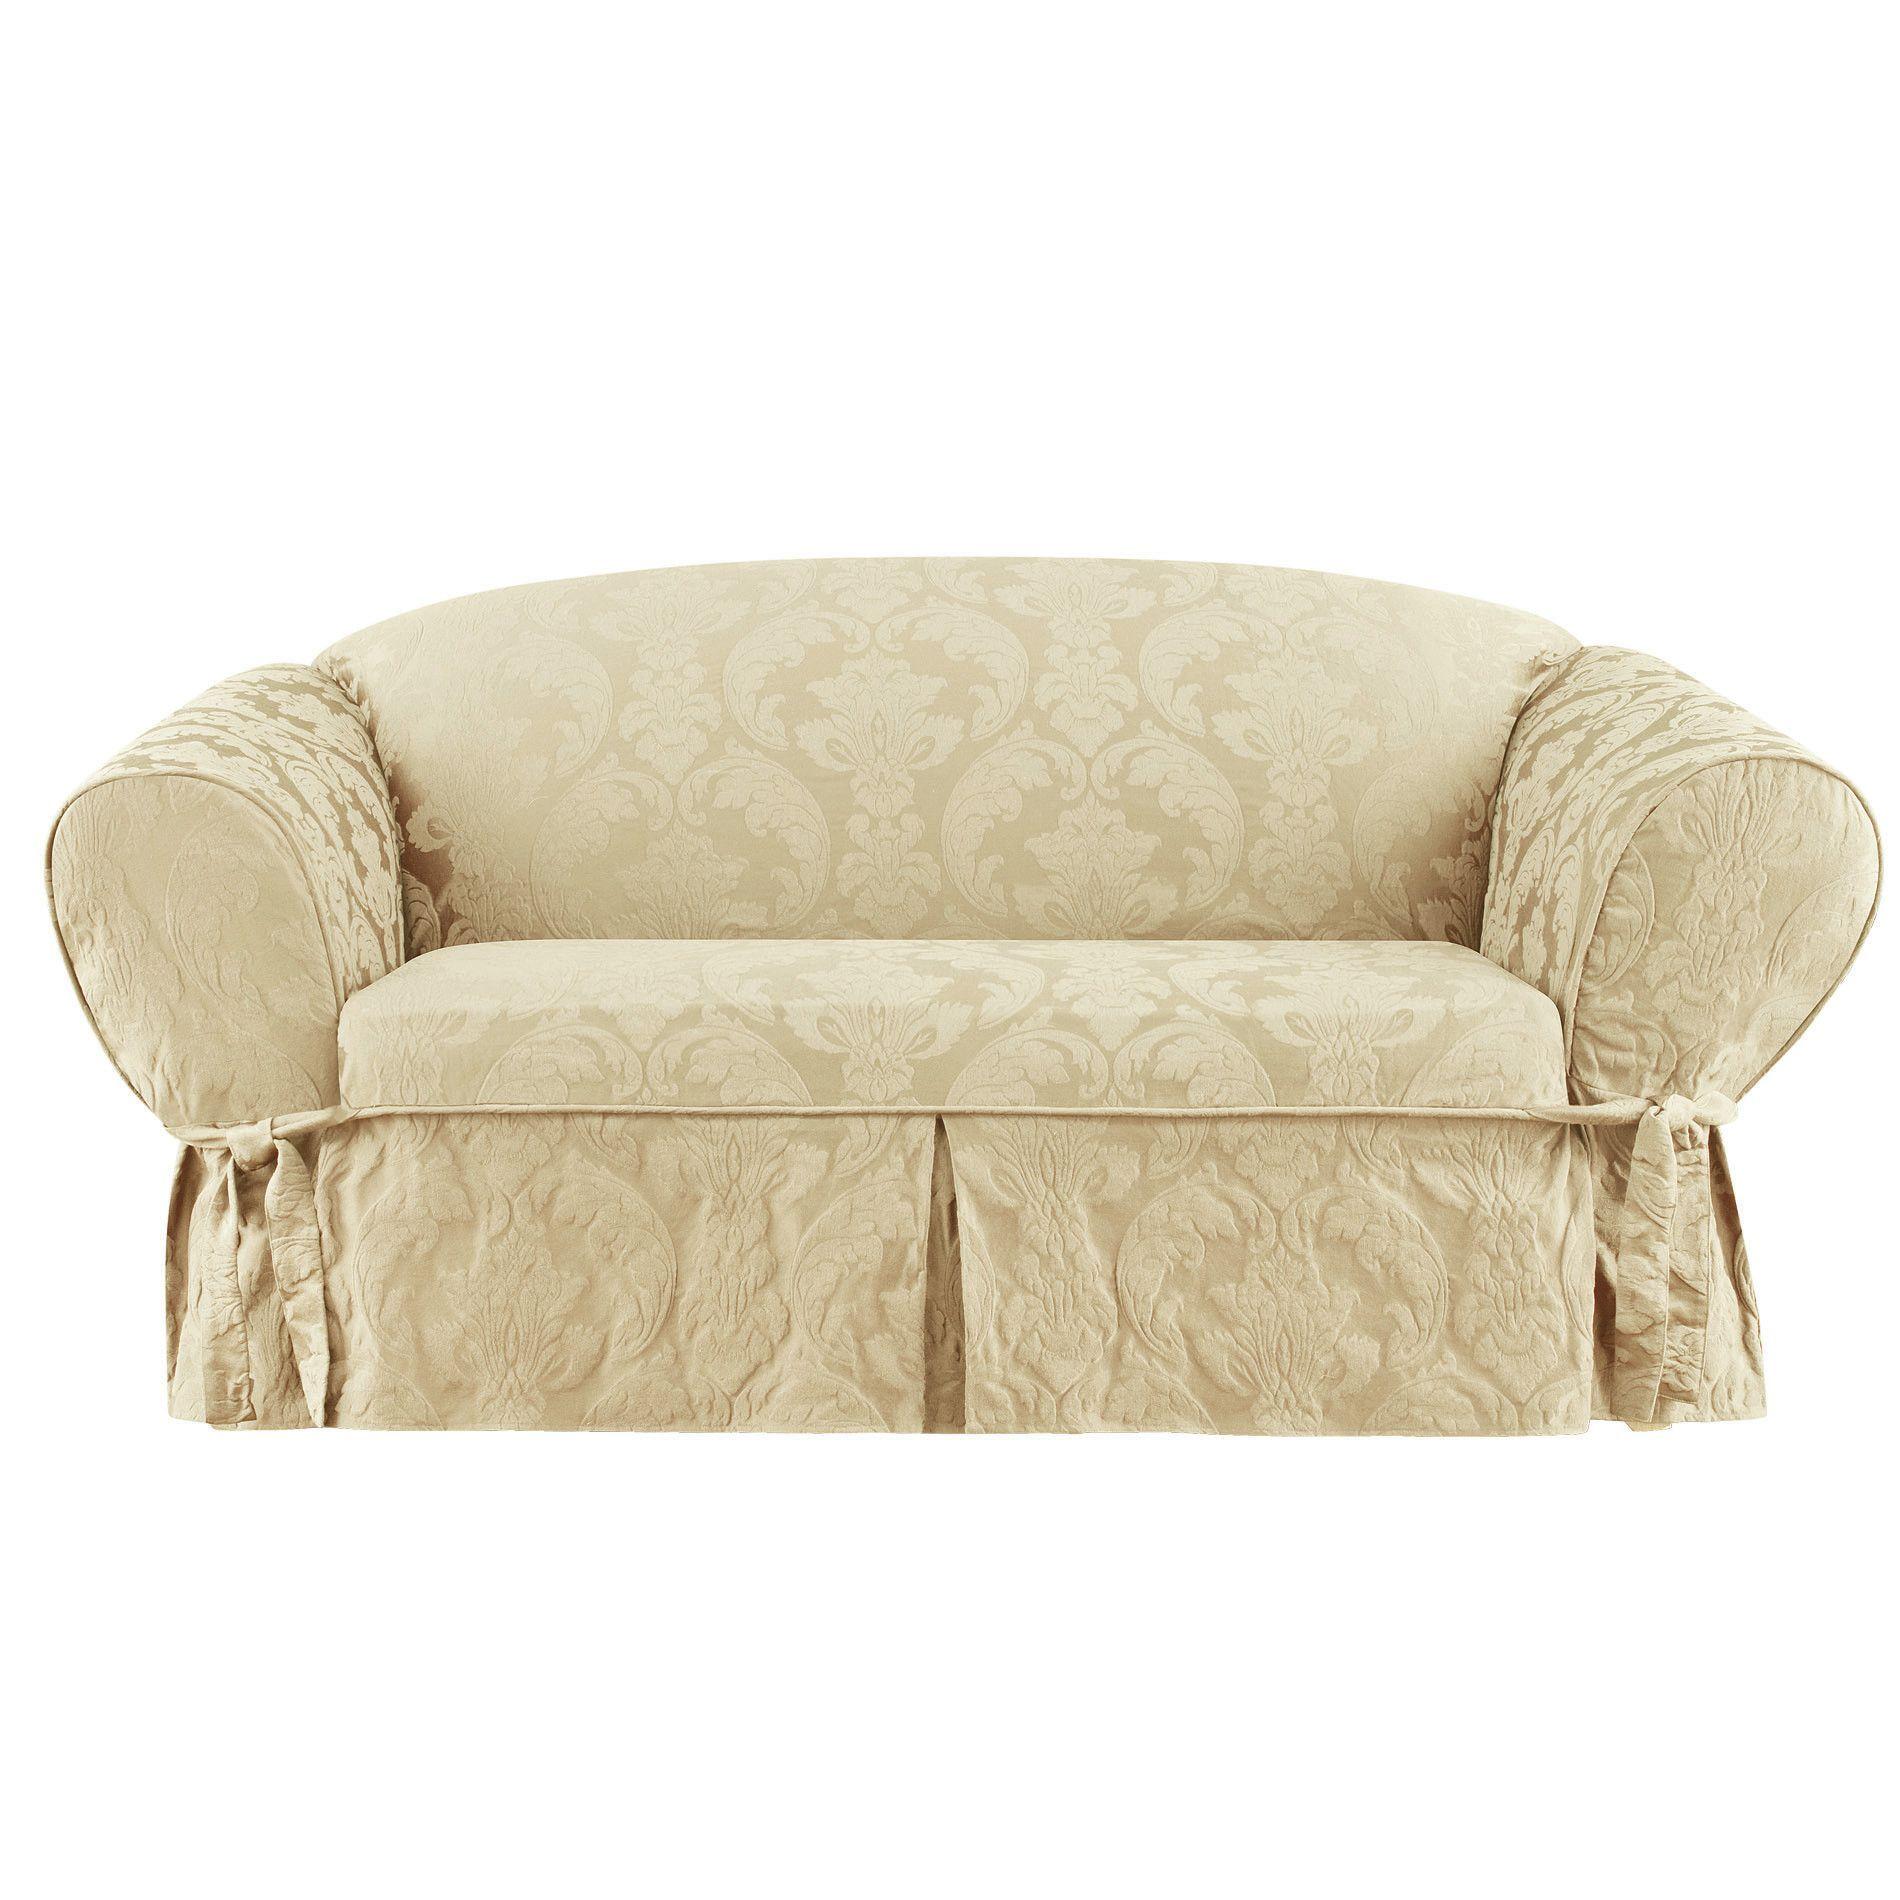 Sure Fit Matelasse Damask Loveseat Slipcover Loveseat Slipcovers Love Seat Furniture Slipcovers